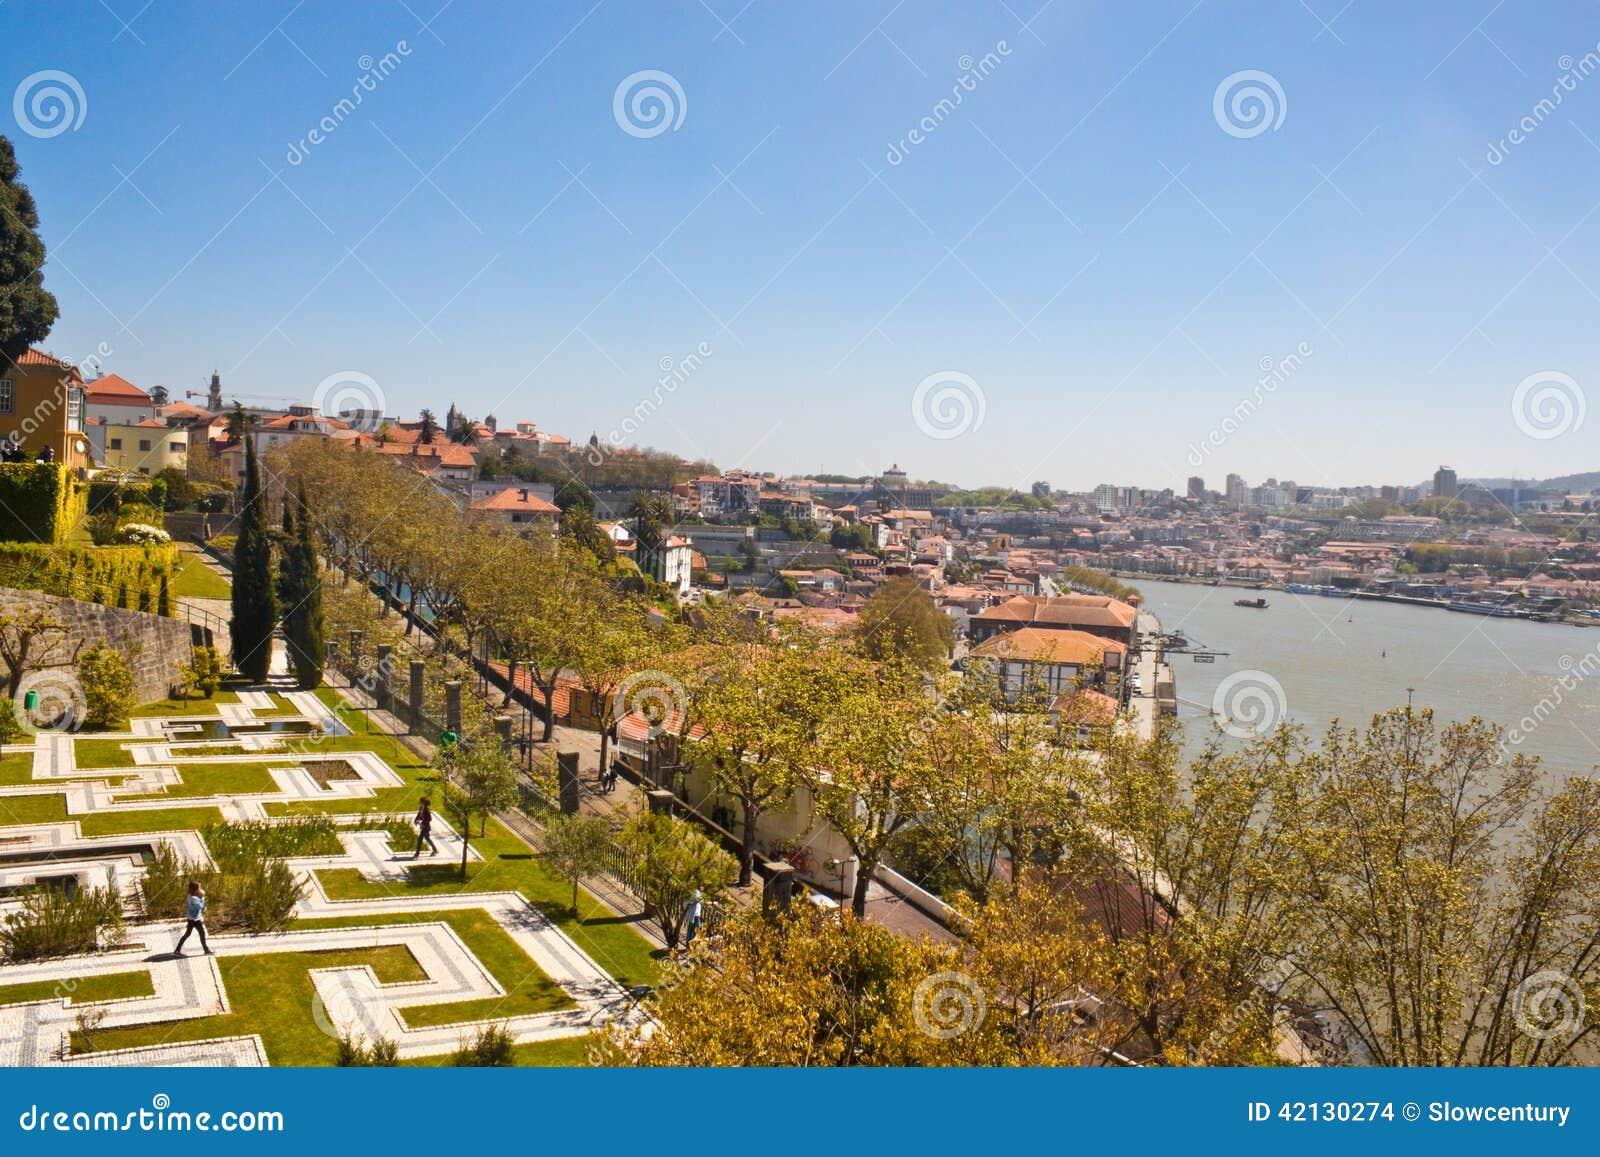 jardim dos sentimentos (garden of feelings) in porto stock photo